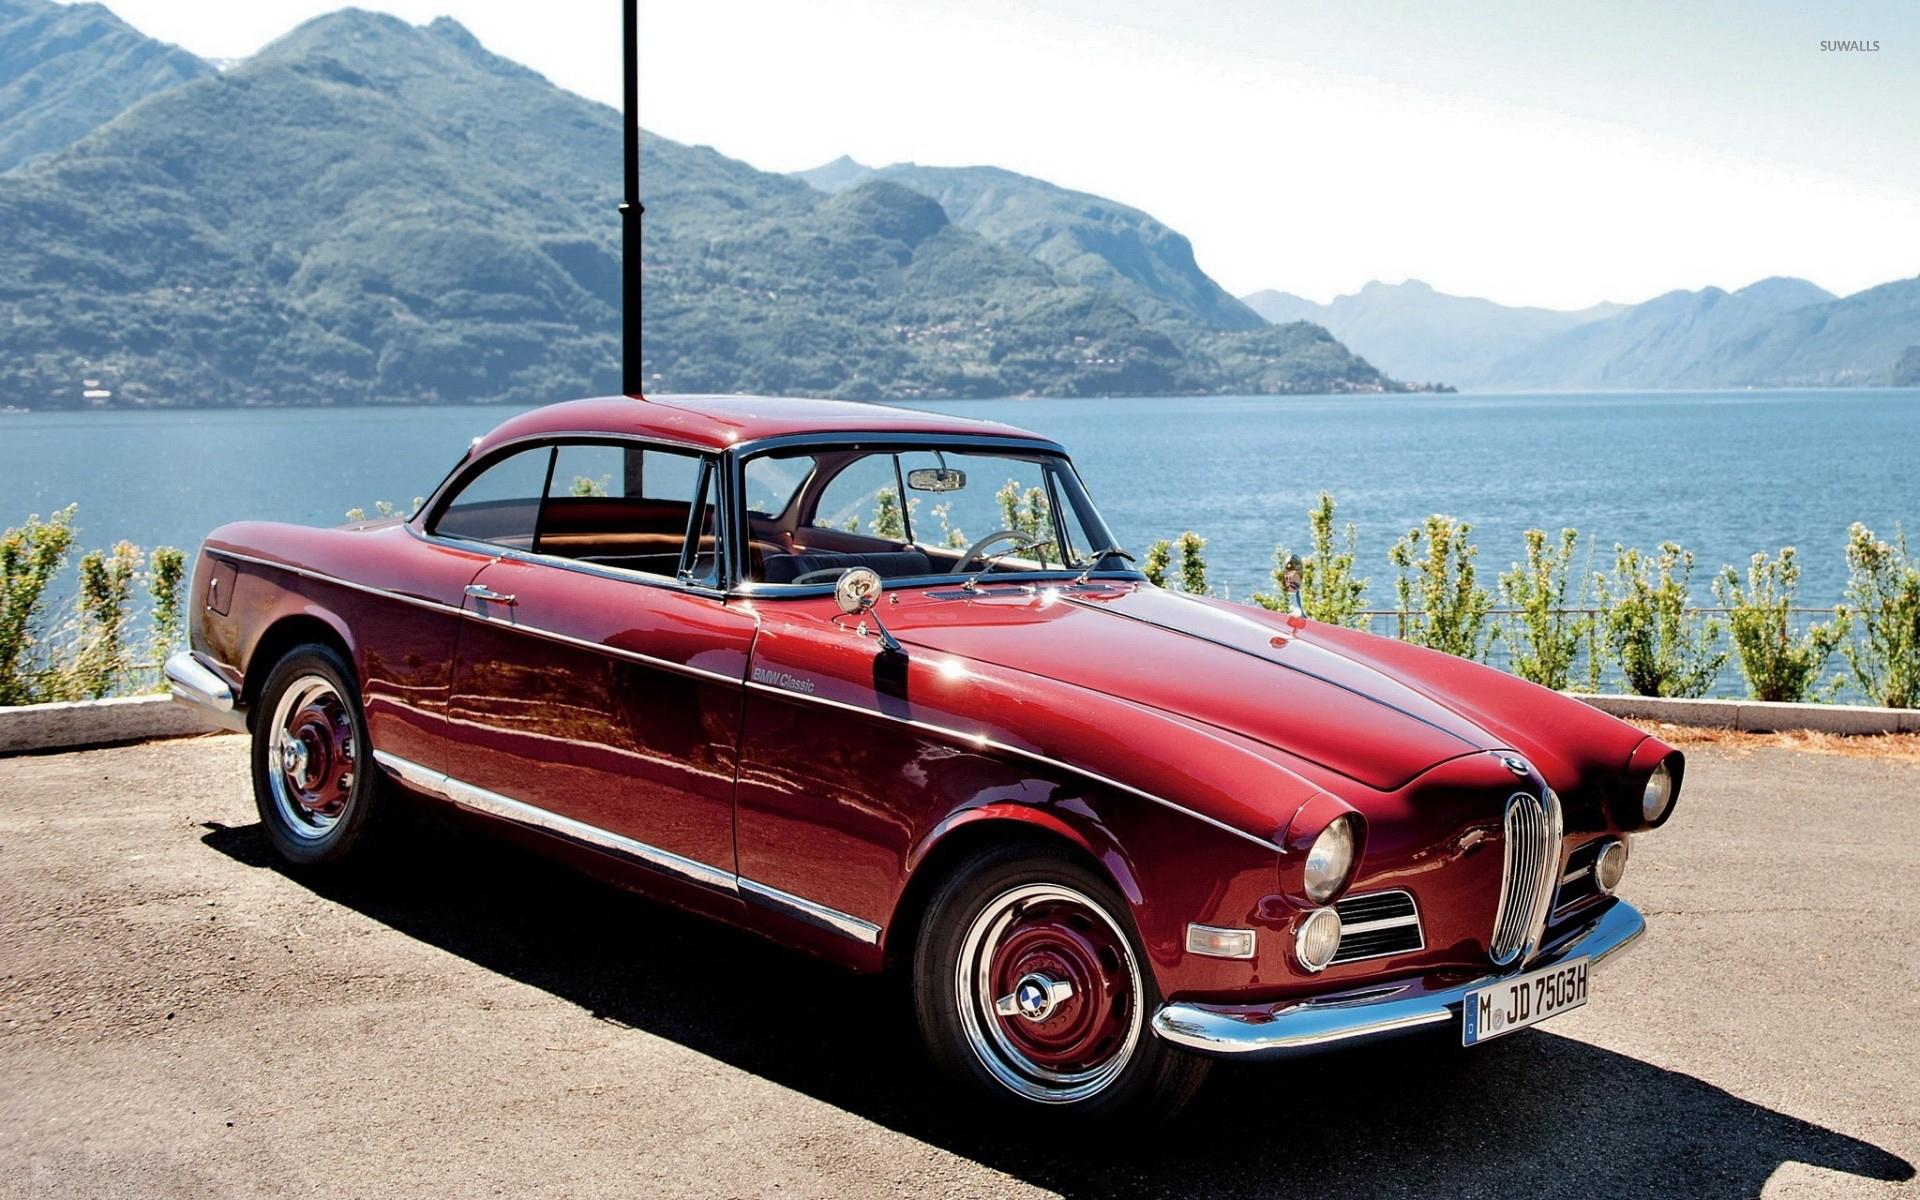 43+ Classic BMW Wallpaper on WallpaperSafari